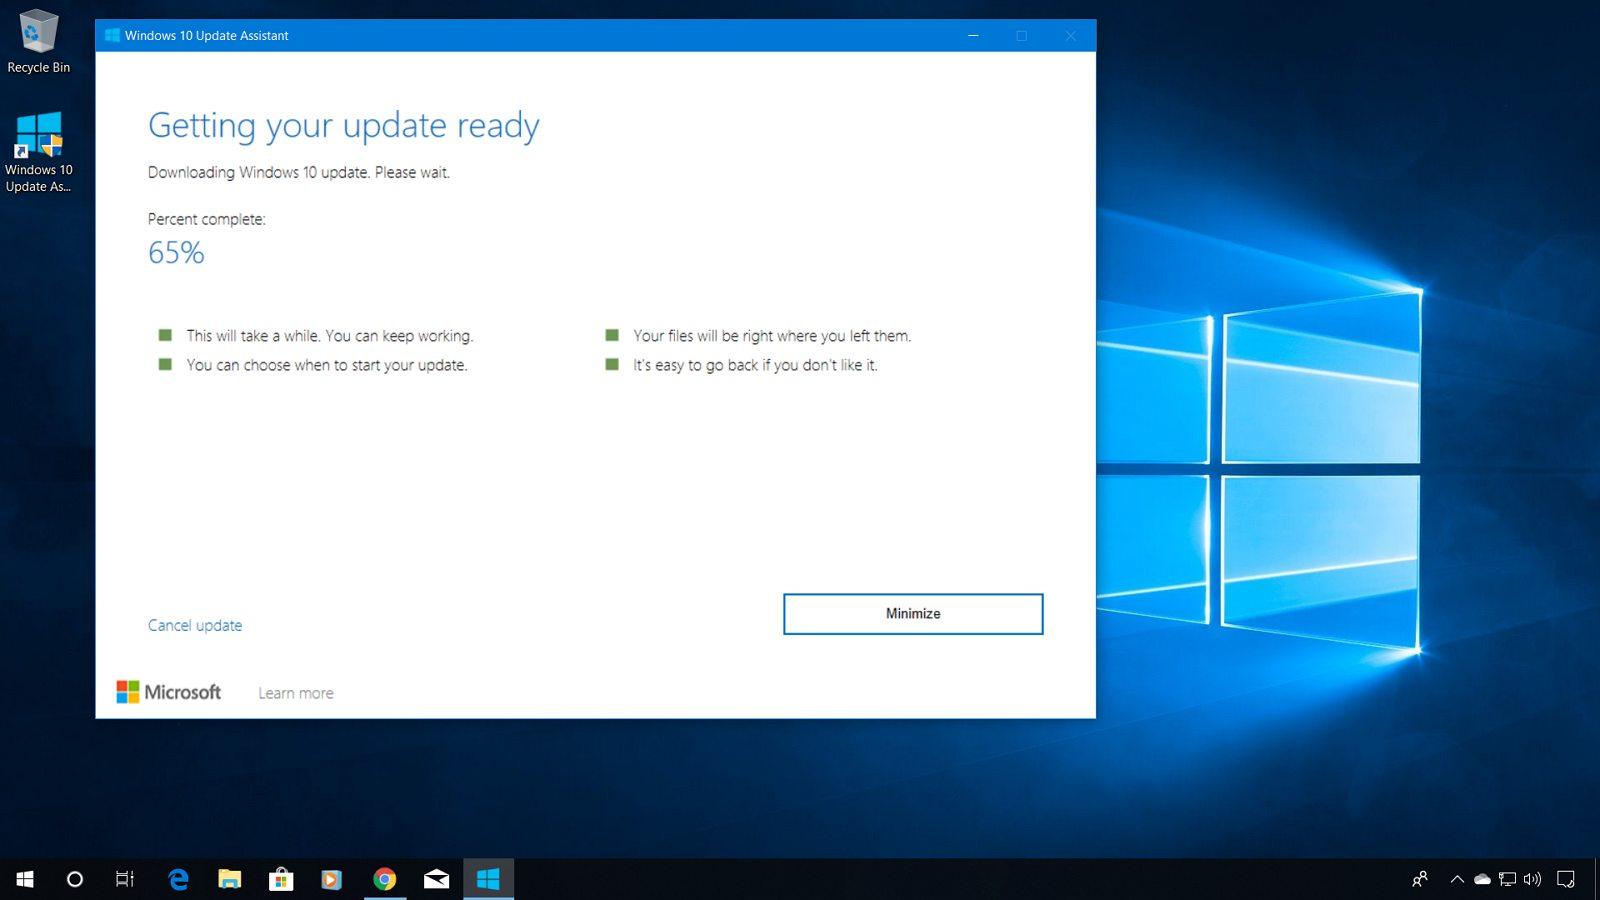 Windows 10 1909 Update Assistant